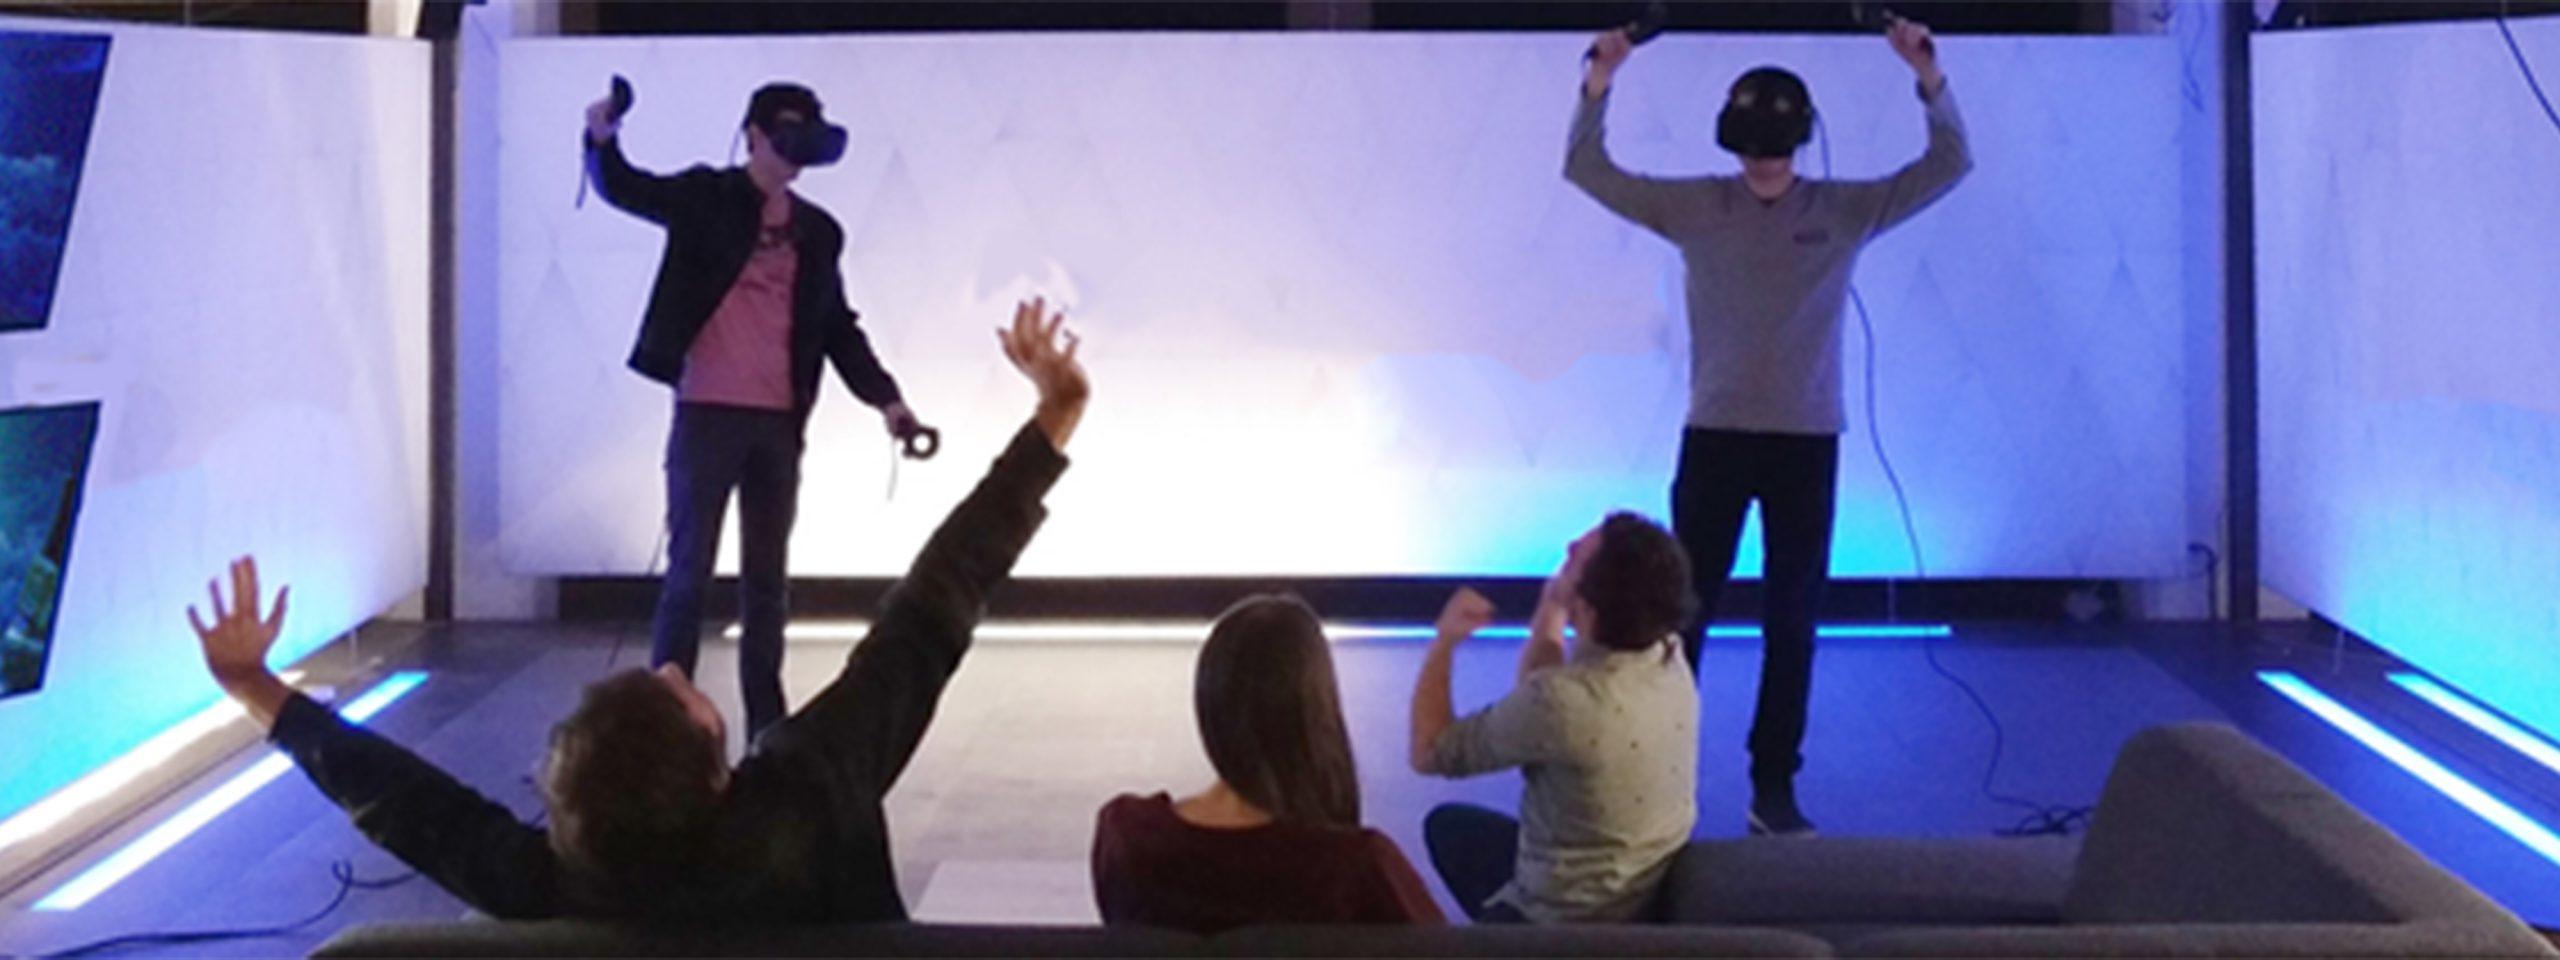 eindhoven-bedrijfsuitje-virtual-reality-challenge